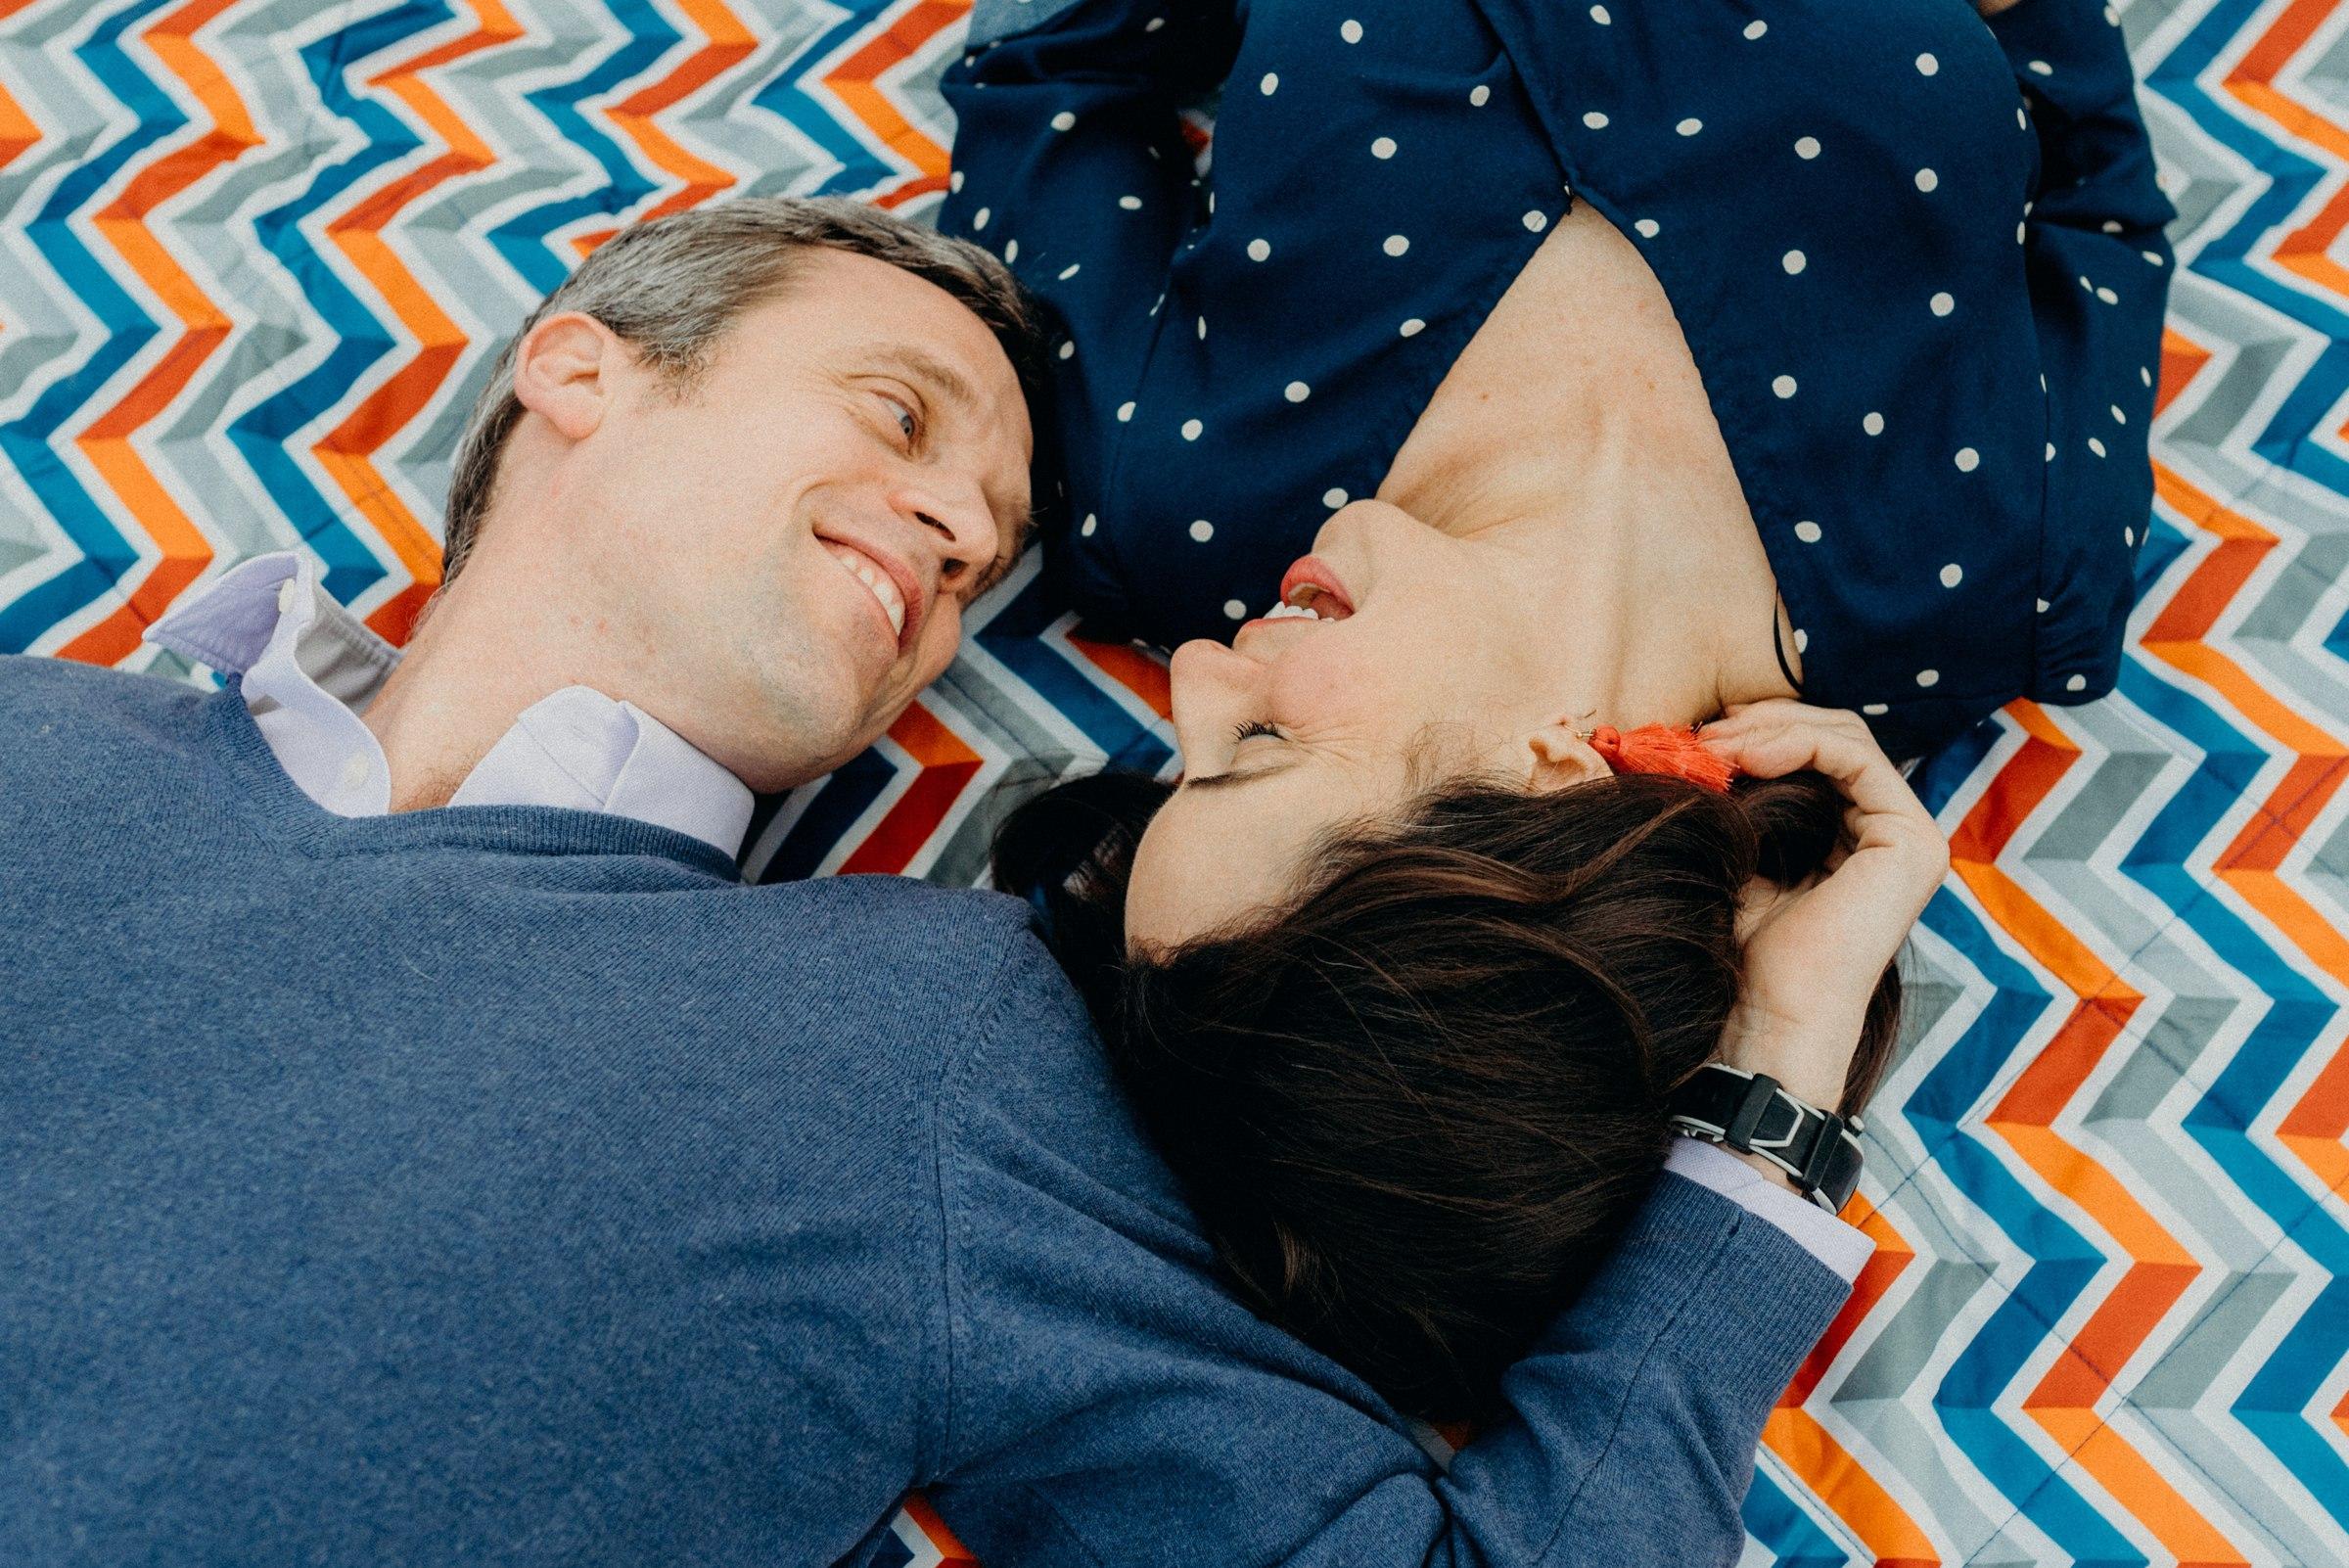 austin-mckinney-falls-engagement-photographer-elopement-prices-best-headshot-senior-adventurous-italy-minneapolis-texas-minnesota-dallas-houston-tulum-mexico_0101.jpg